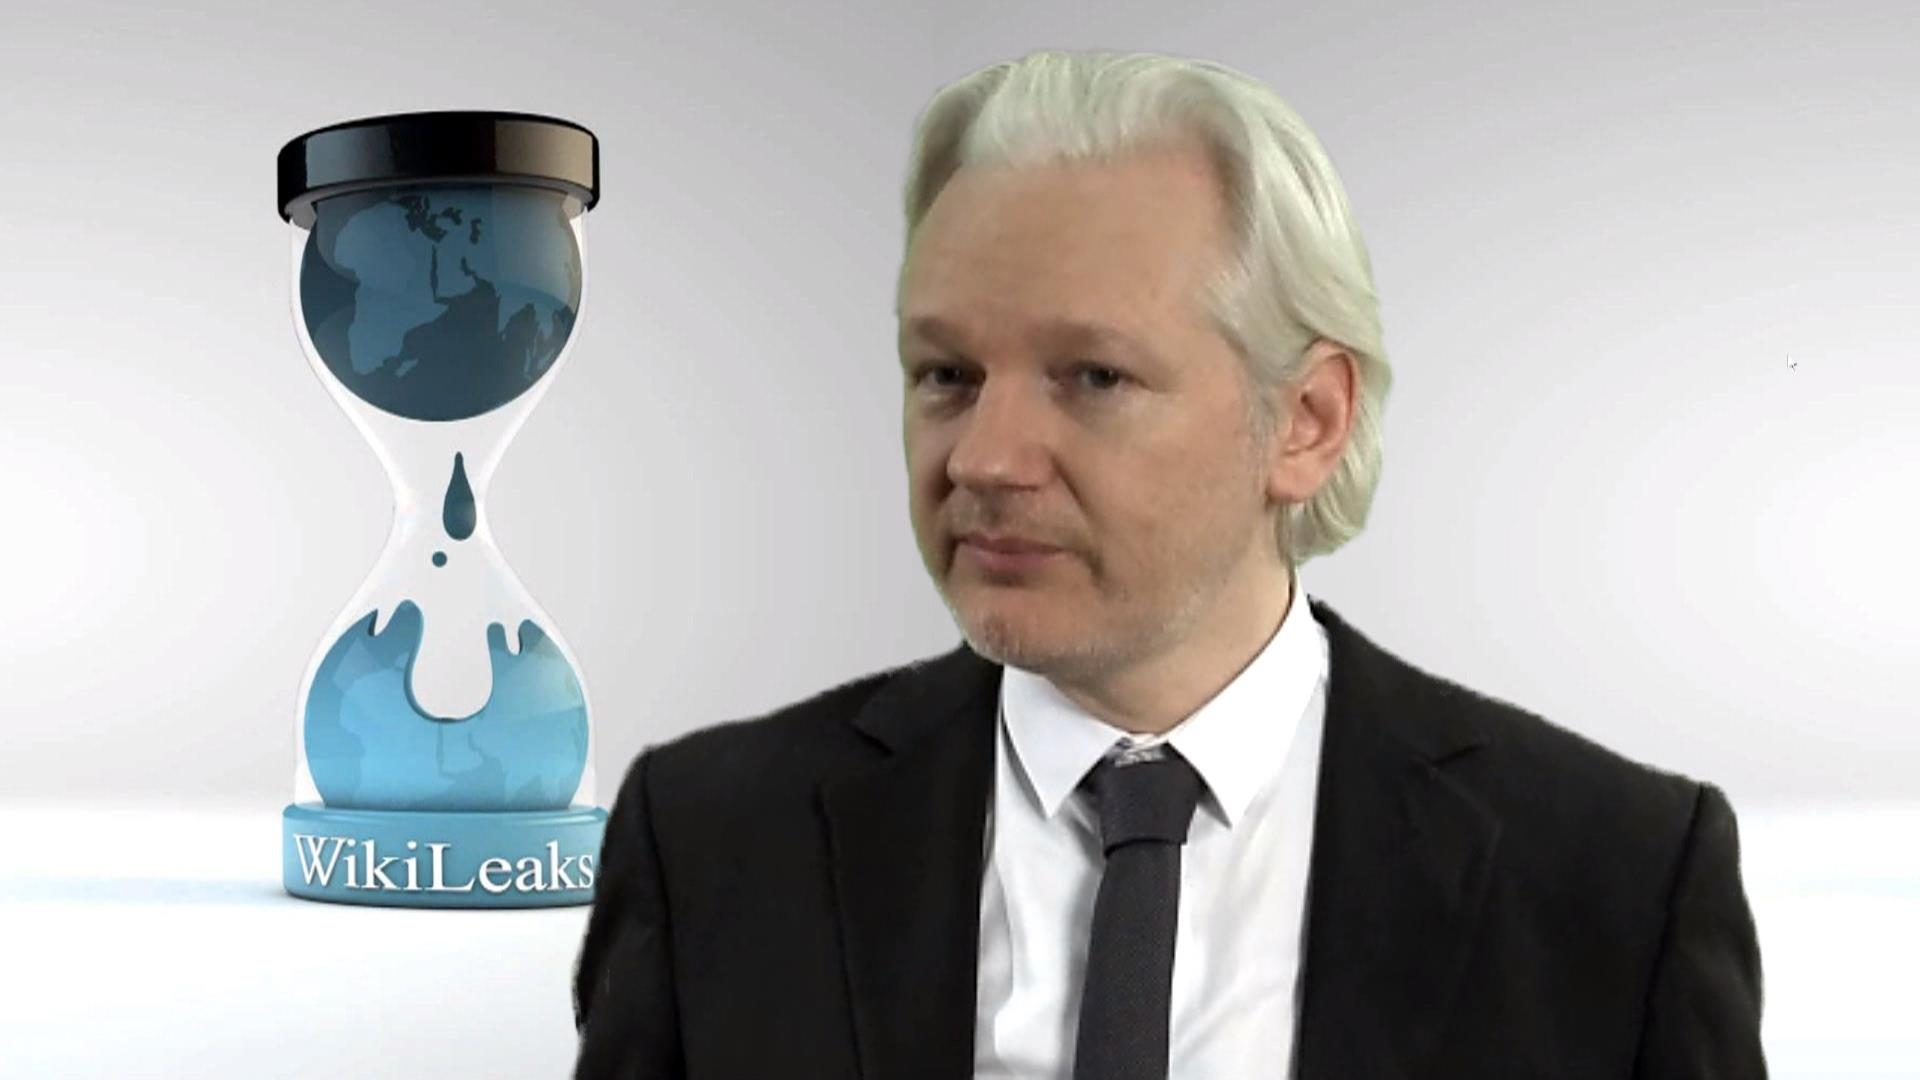 Джулиан Ассанж - основатель WikiLeaks Фото: abcnews.go